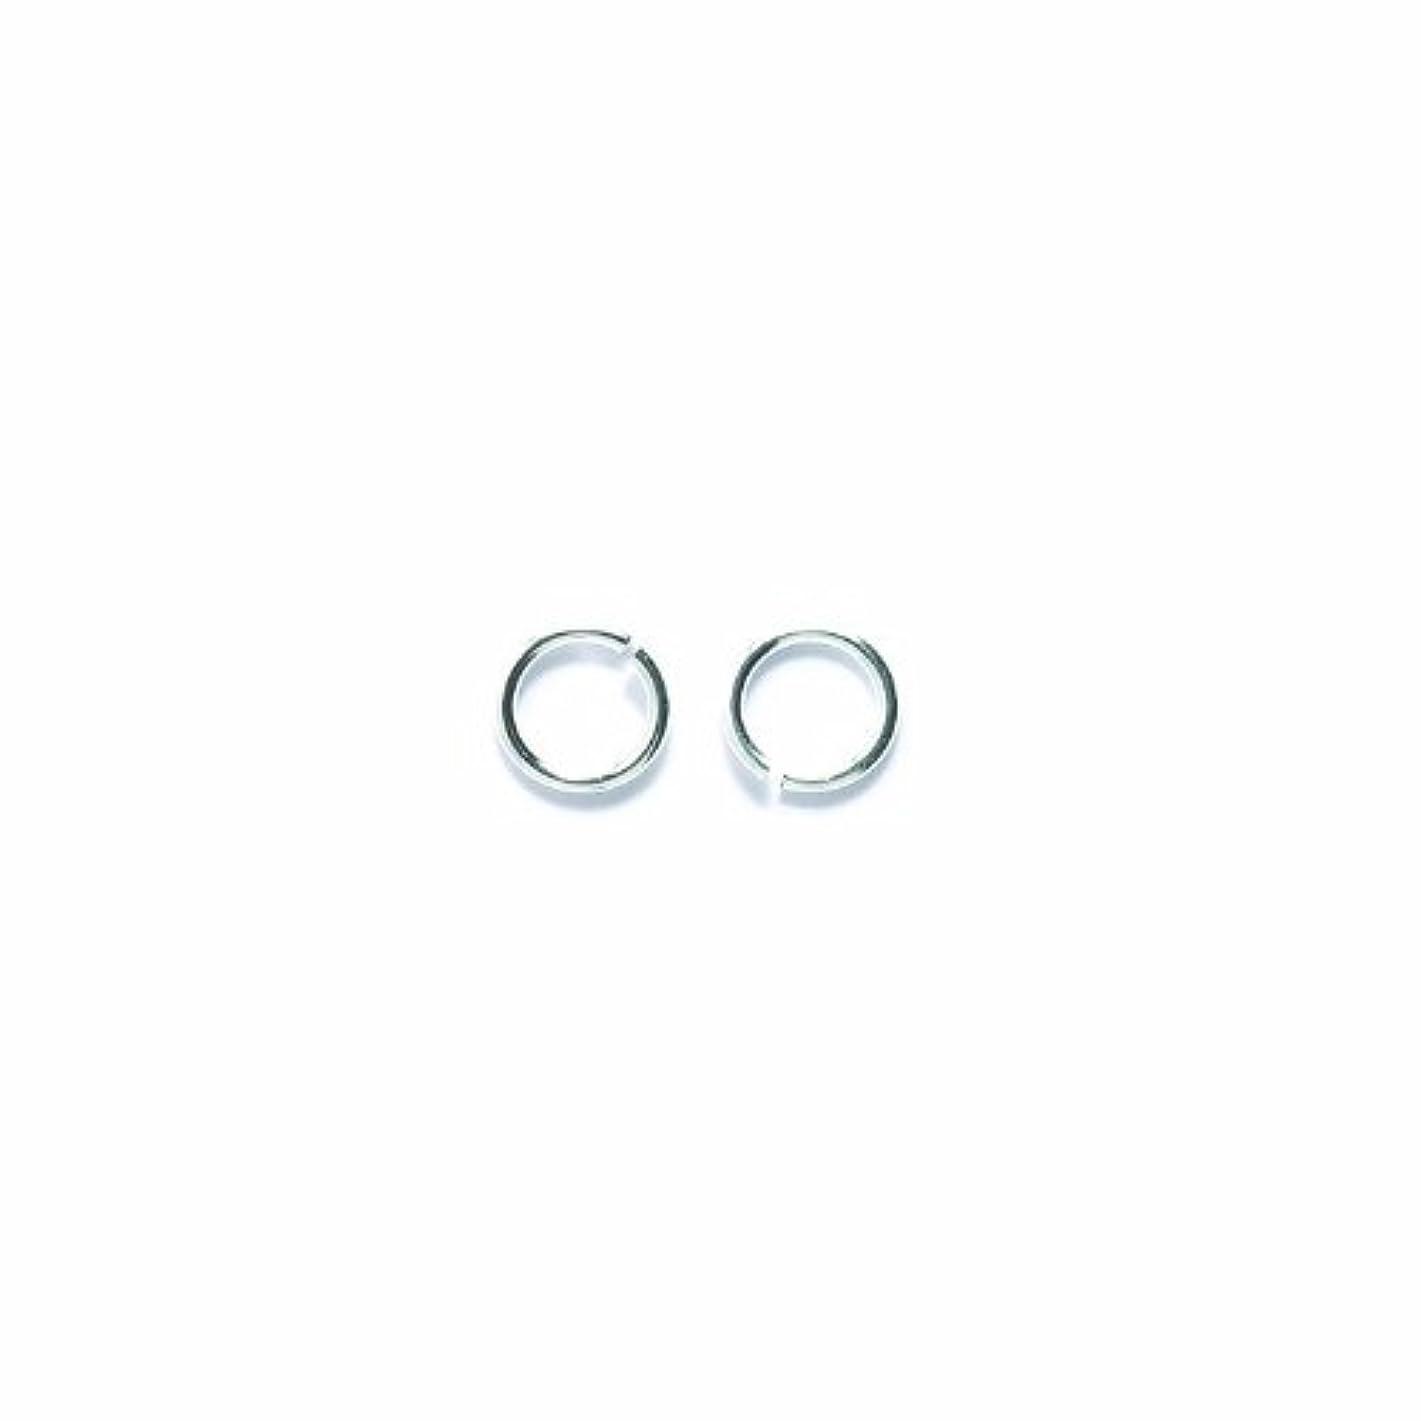 Shipwreck Beads Plated Brass Jump Ring, 8 mm, 19-Gauge, Metallic, Silver, 50 gm Pack